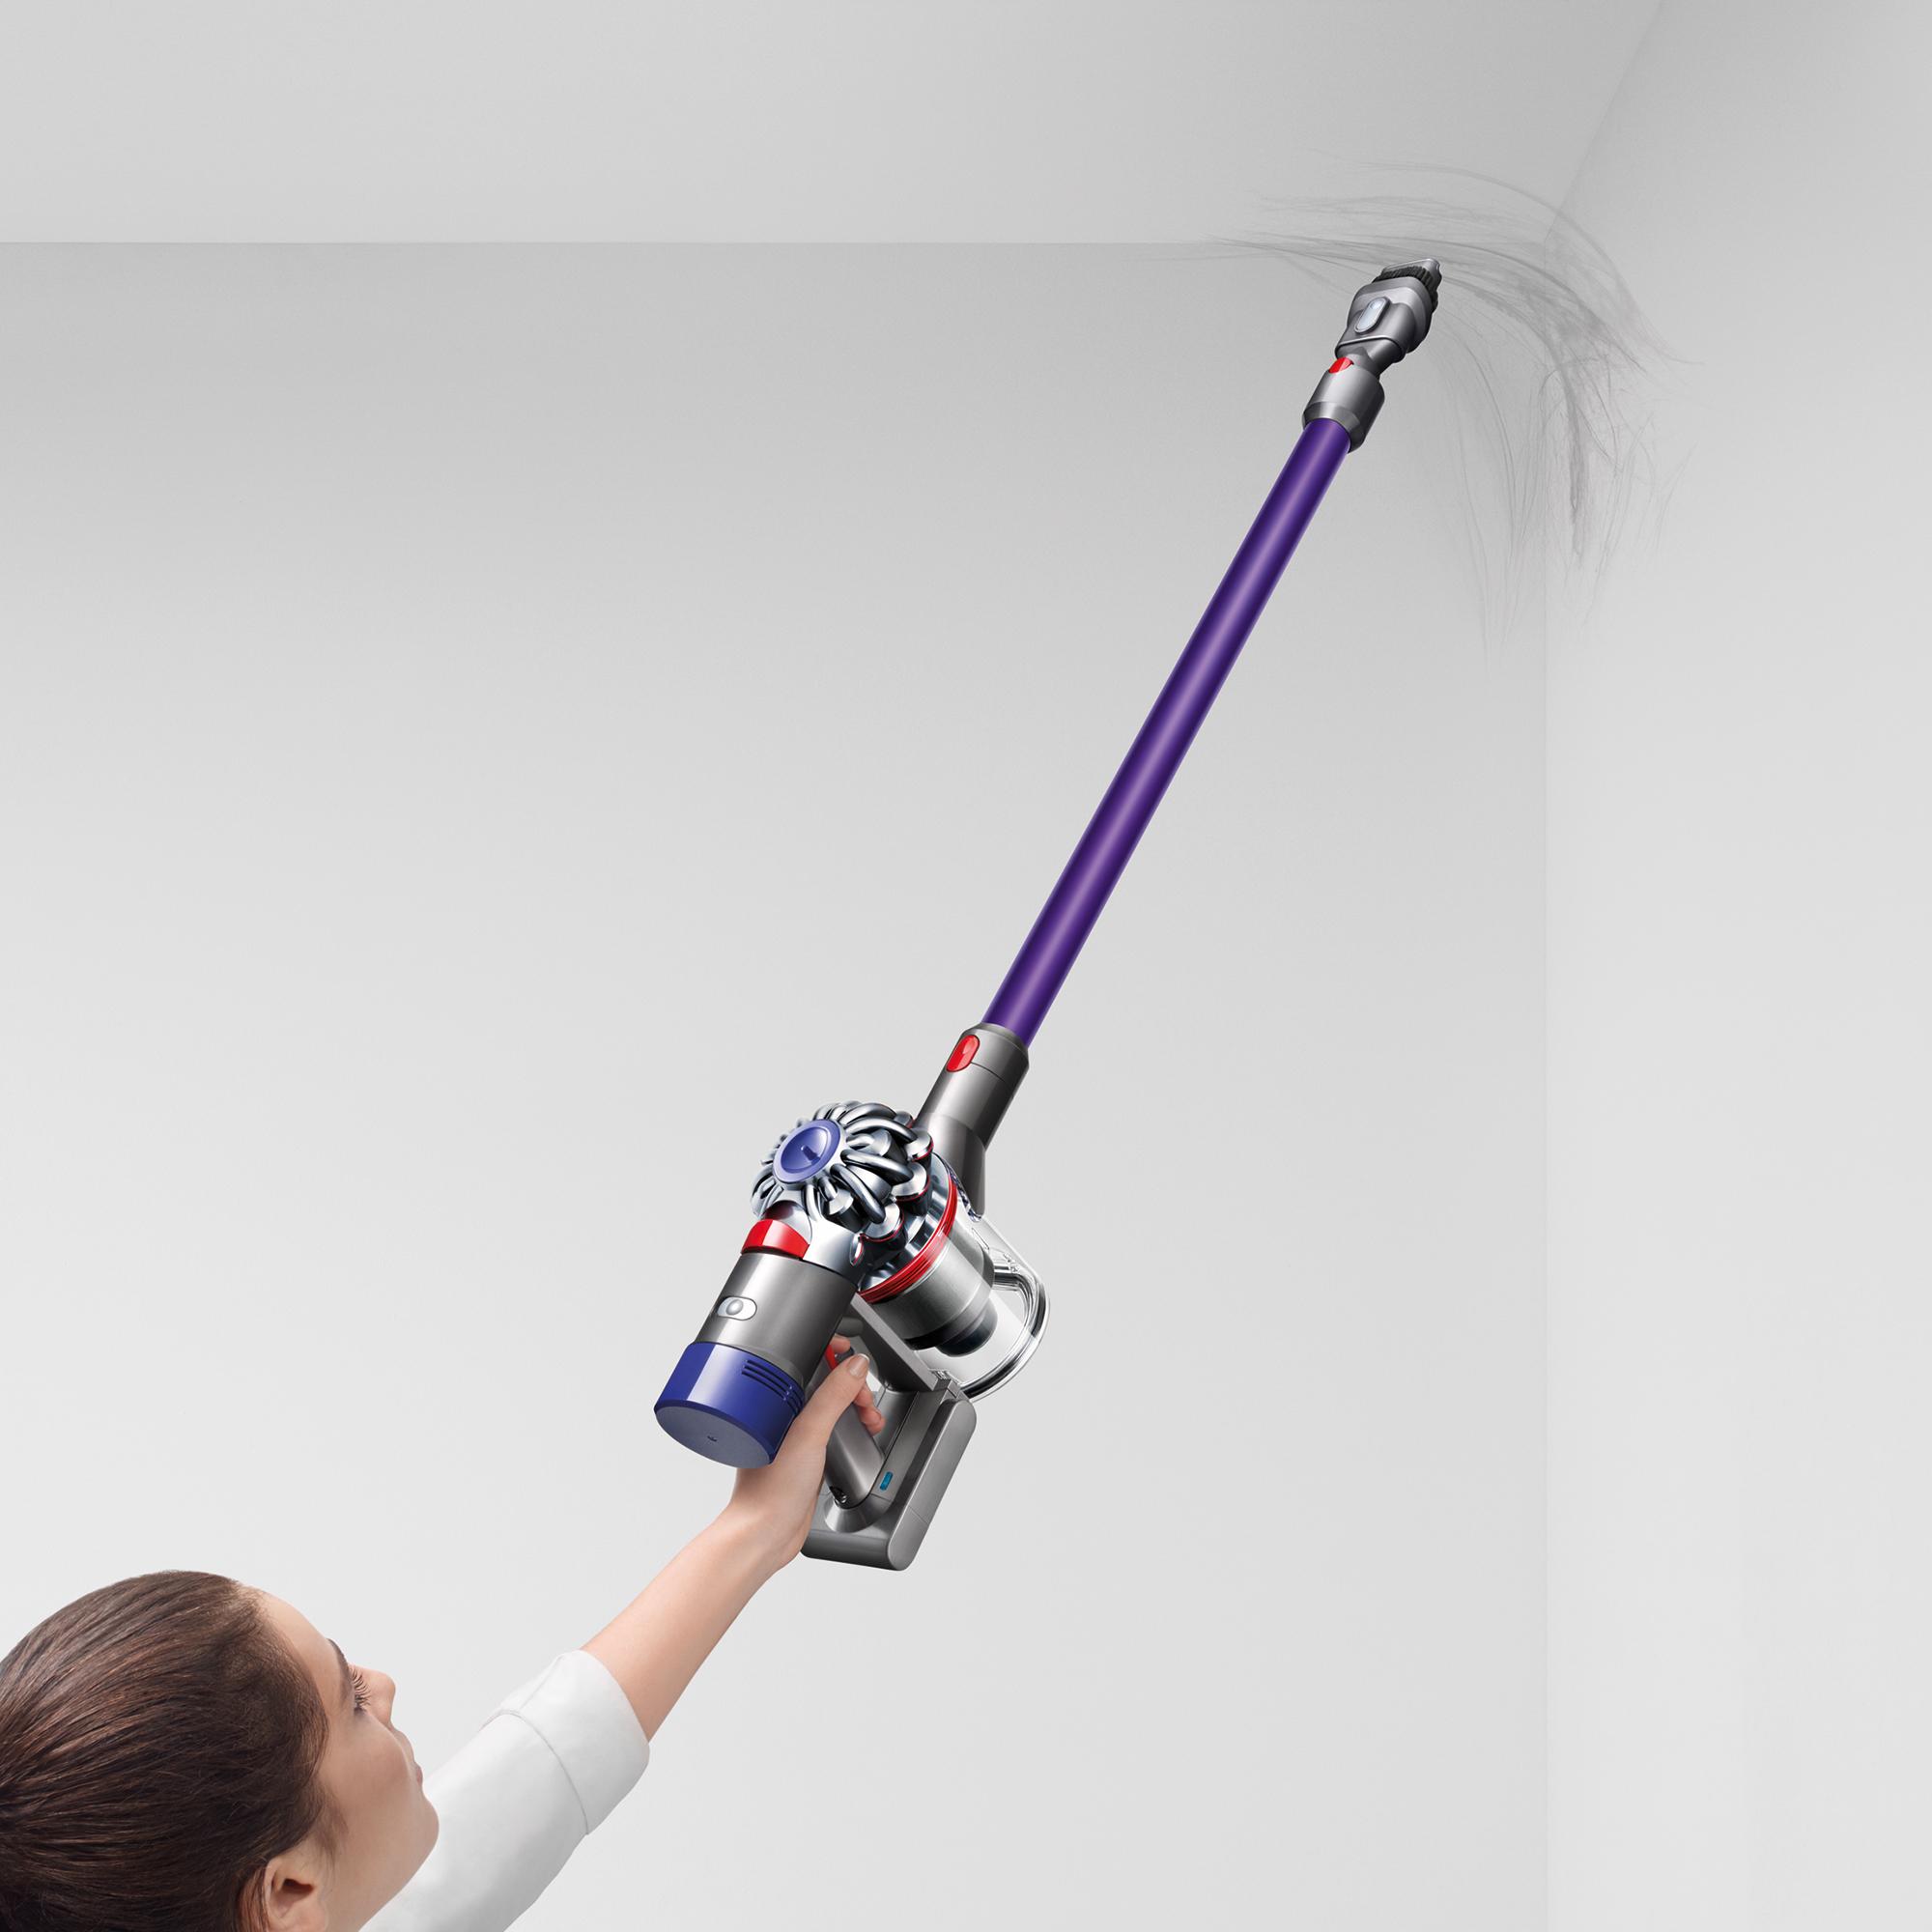 Dyson-V7-Animal-Cordless-HEPA-Vacuum-with-Bonus-Tools-New thumbnail 26